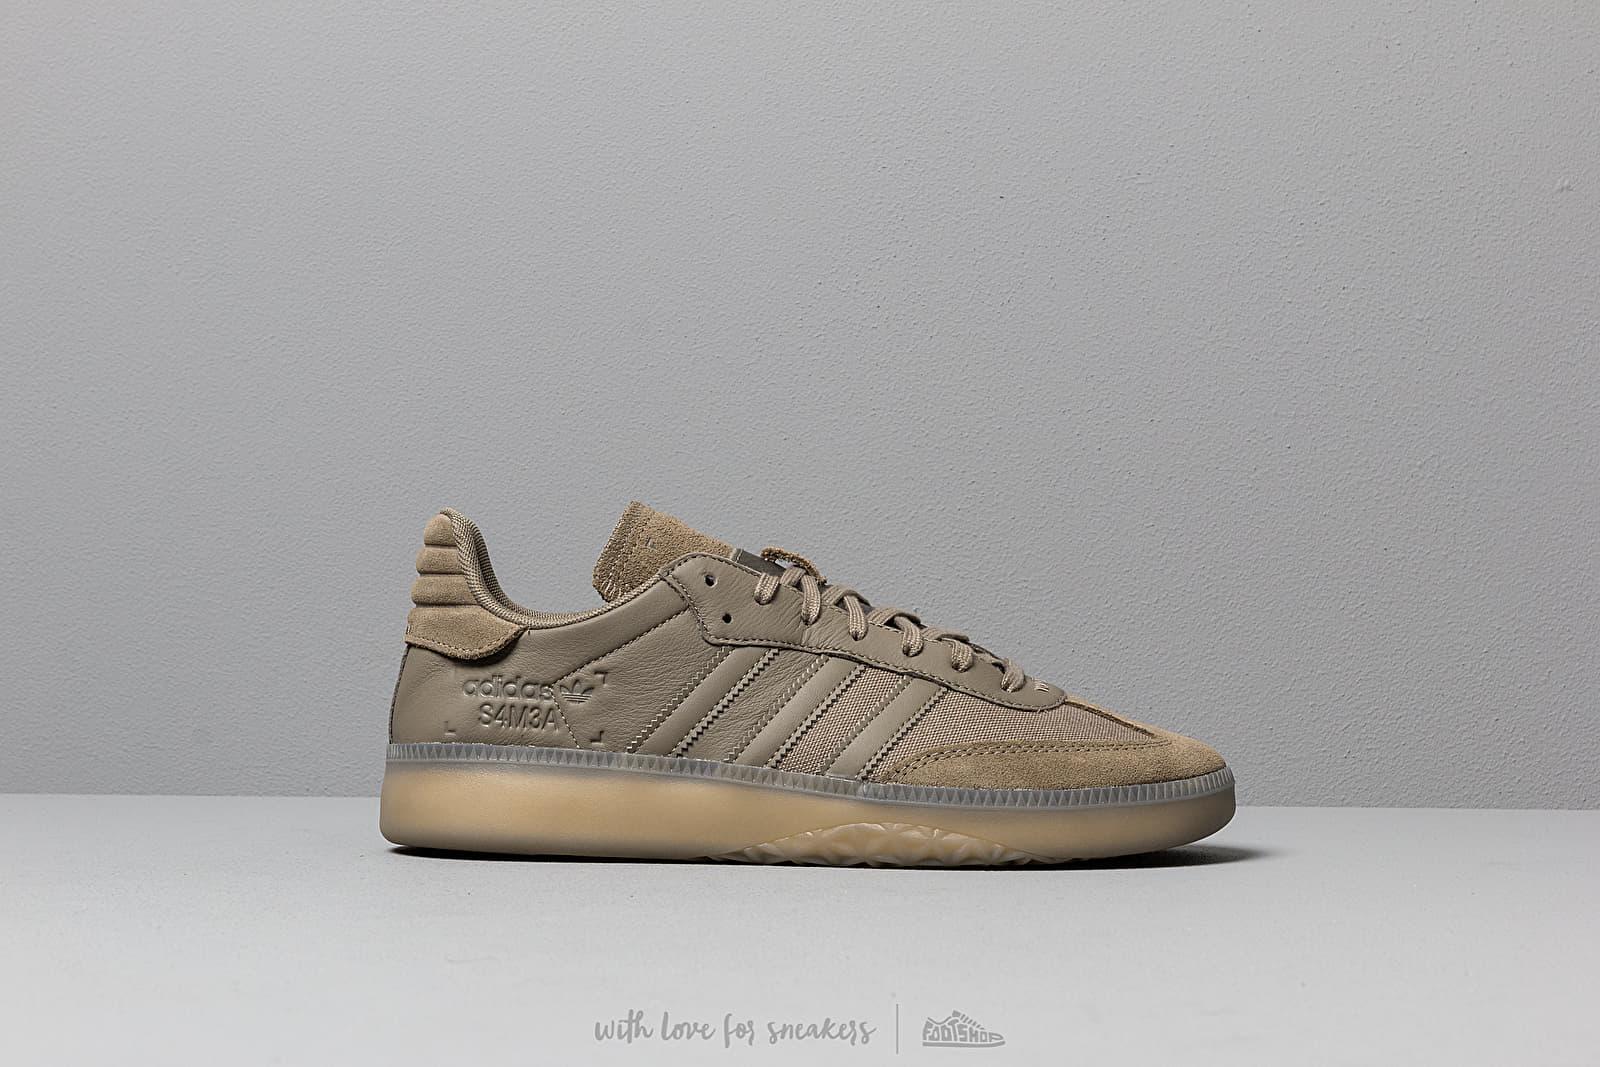 Grey Adidas Samba FourFootshop Simple Rm Brown PkTlwZiOXu